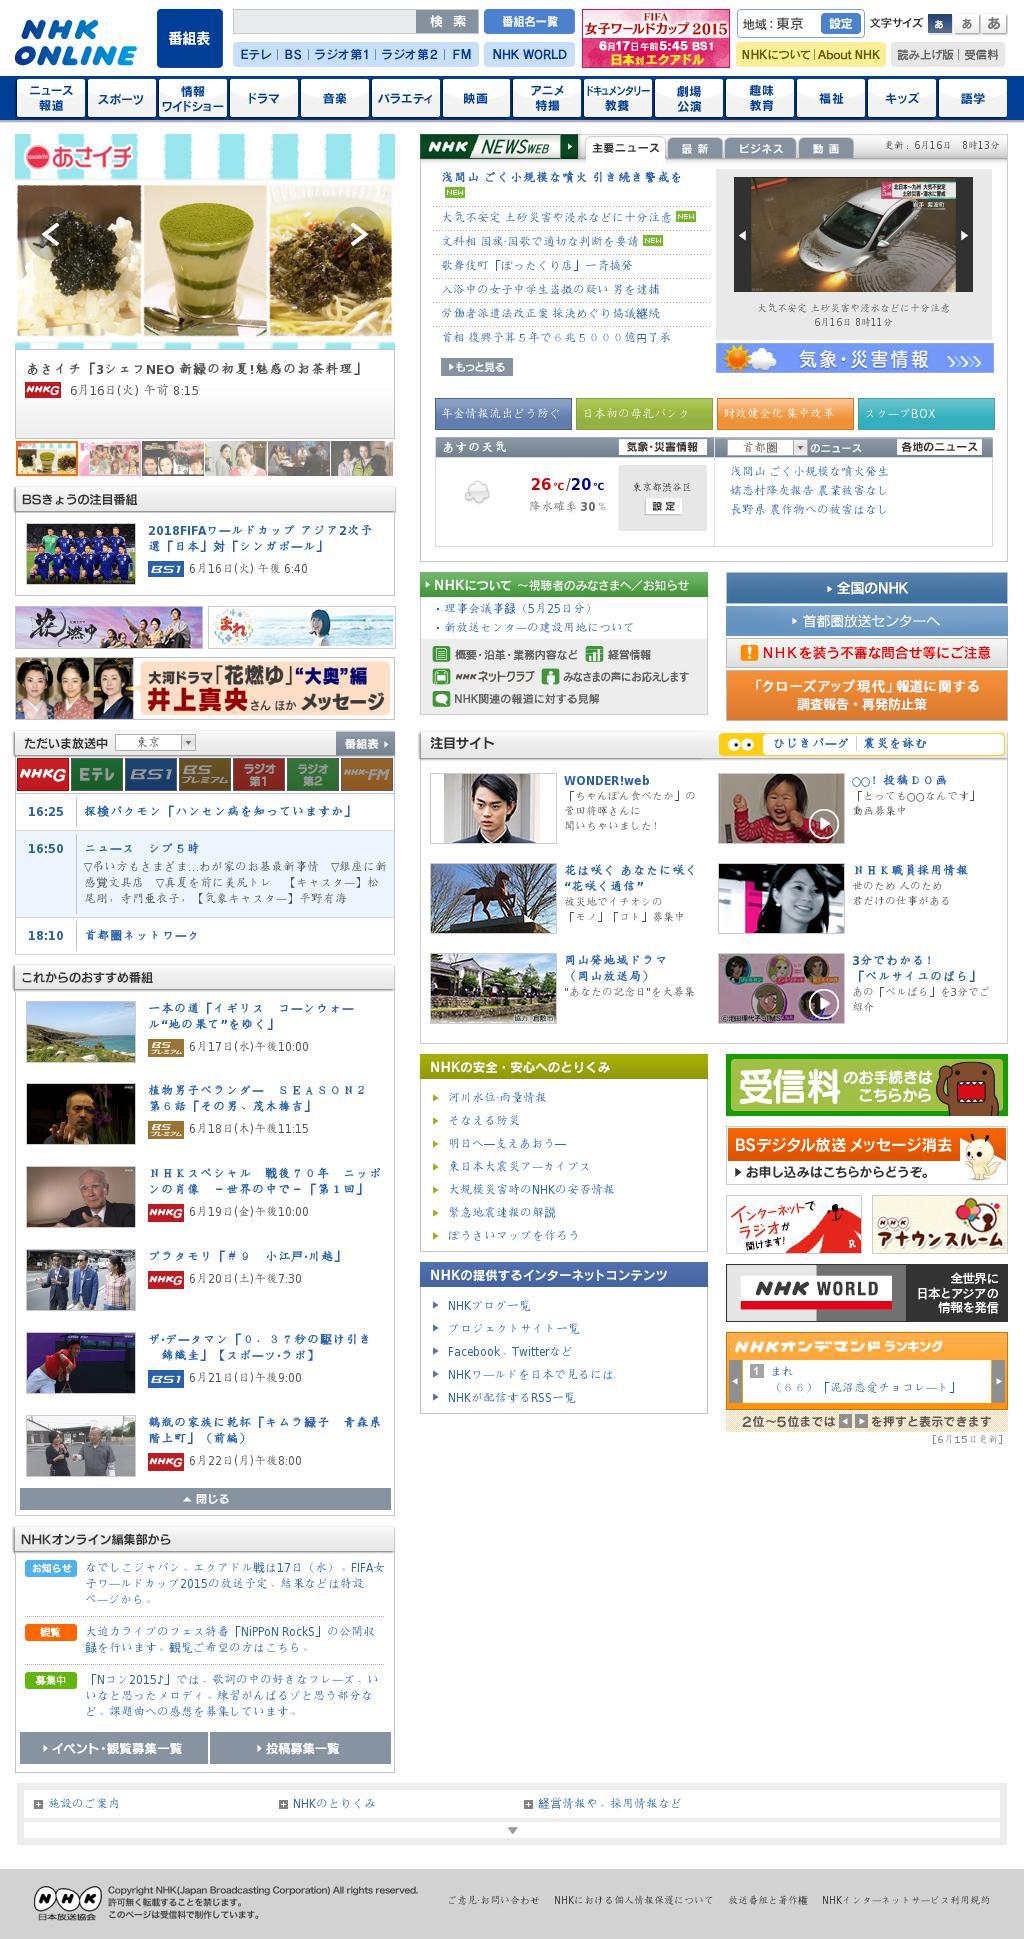 NHK Online at Tuesday June 16, 2015, 8:14 a.m. UTC